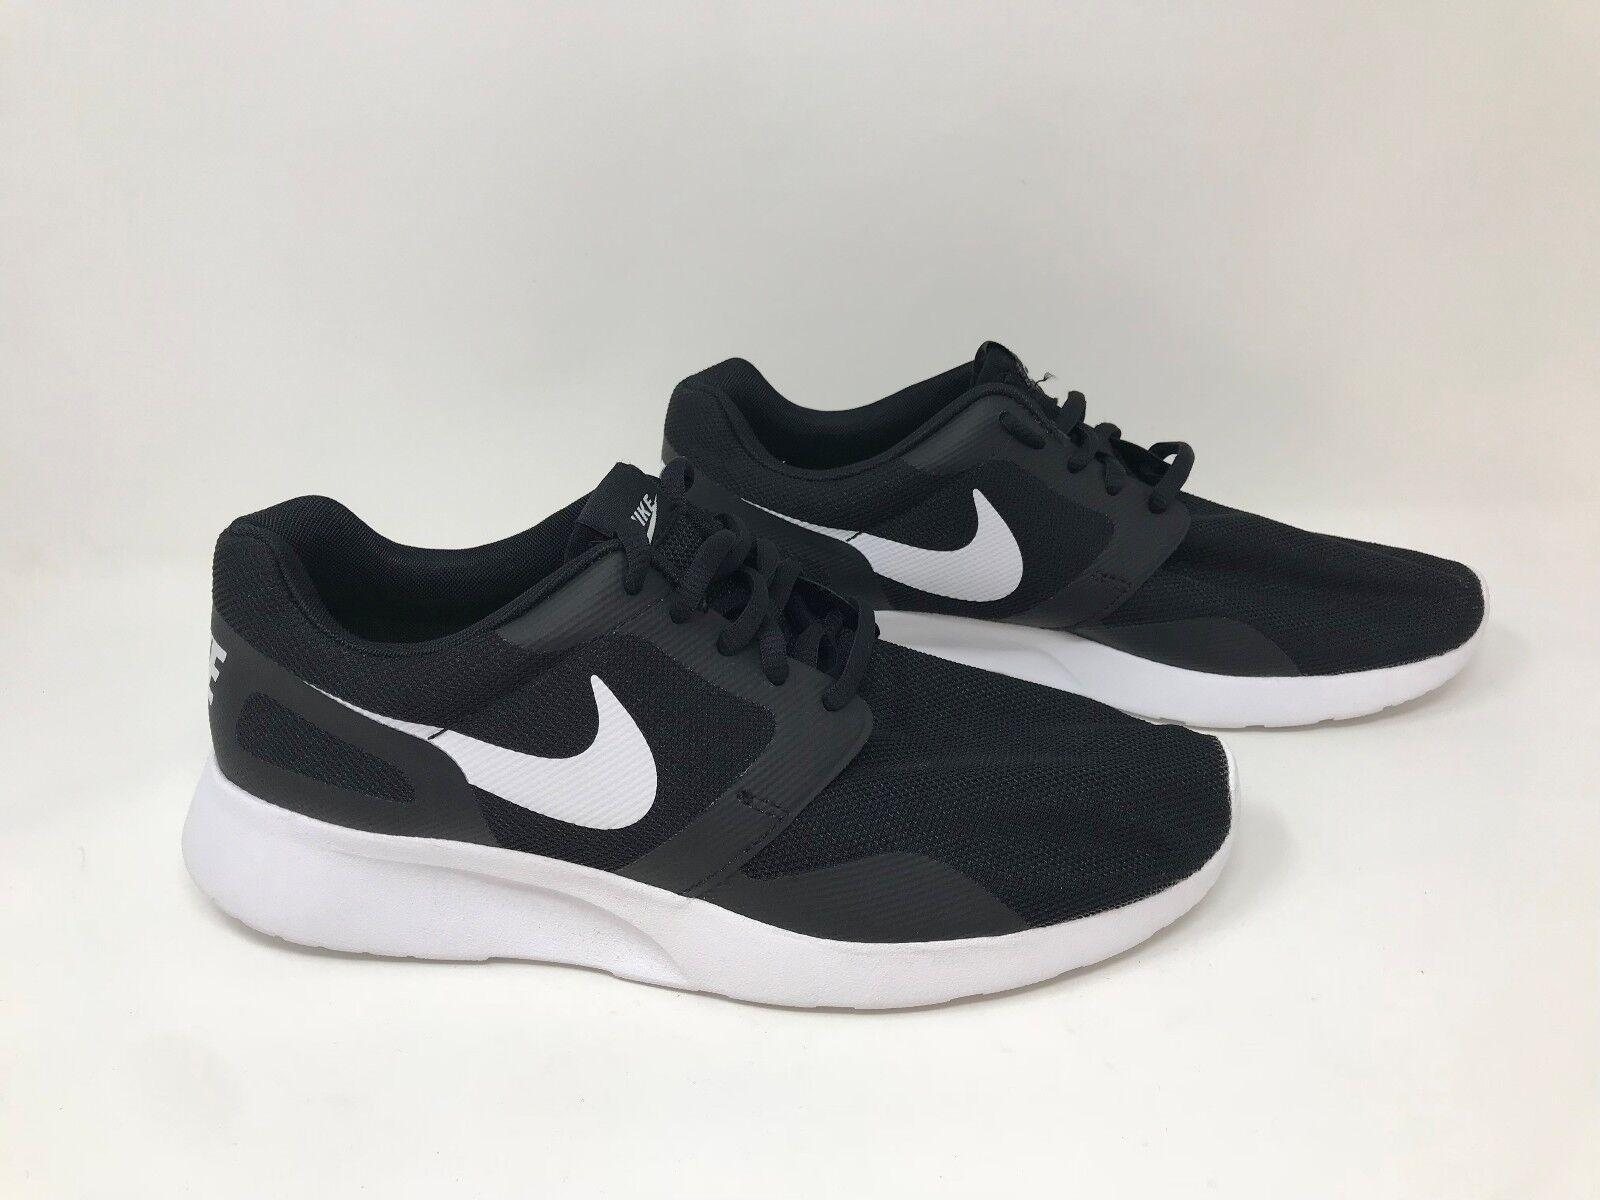 New! Men's Nike 747492-010 Kashi NS Running Shoes - Black/White J61